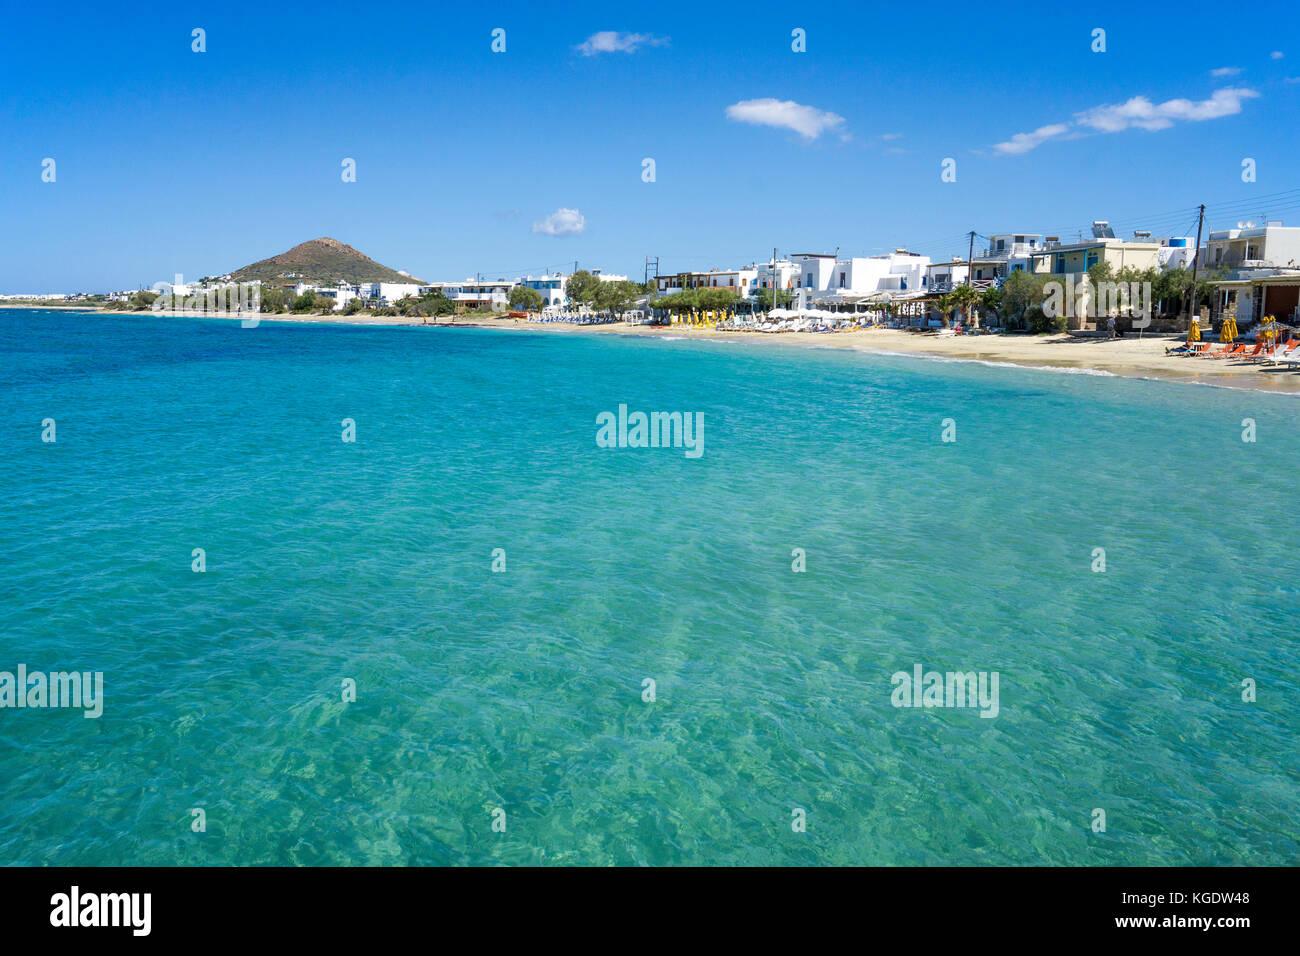 Beach of Agios Prokopios ,west side of Naxos, Cyclades, Greece, Mediterranean Sea, Europe Stock Photo